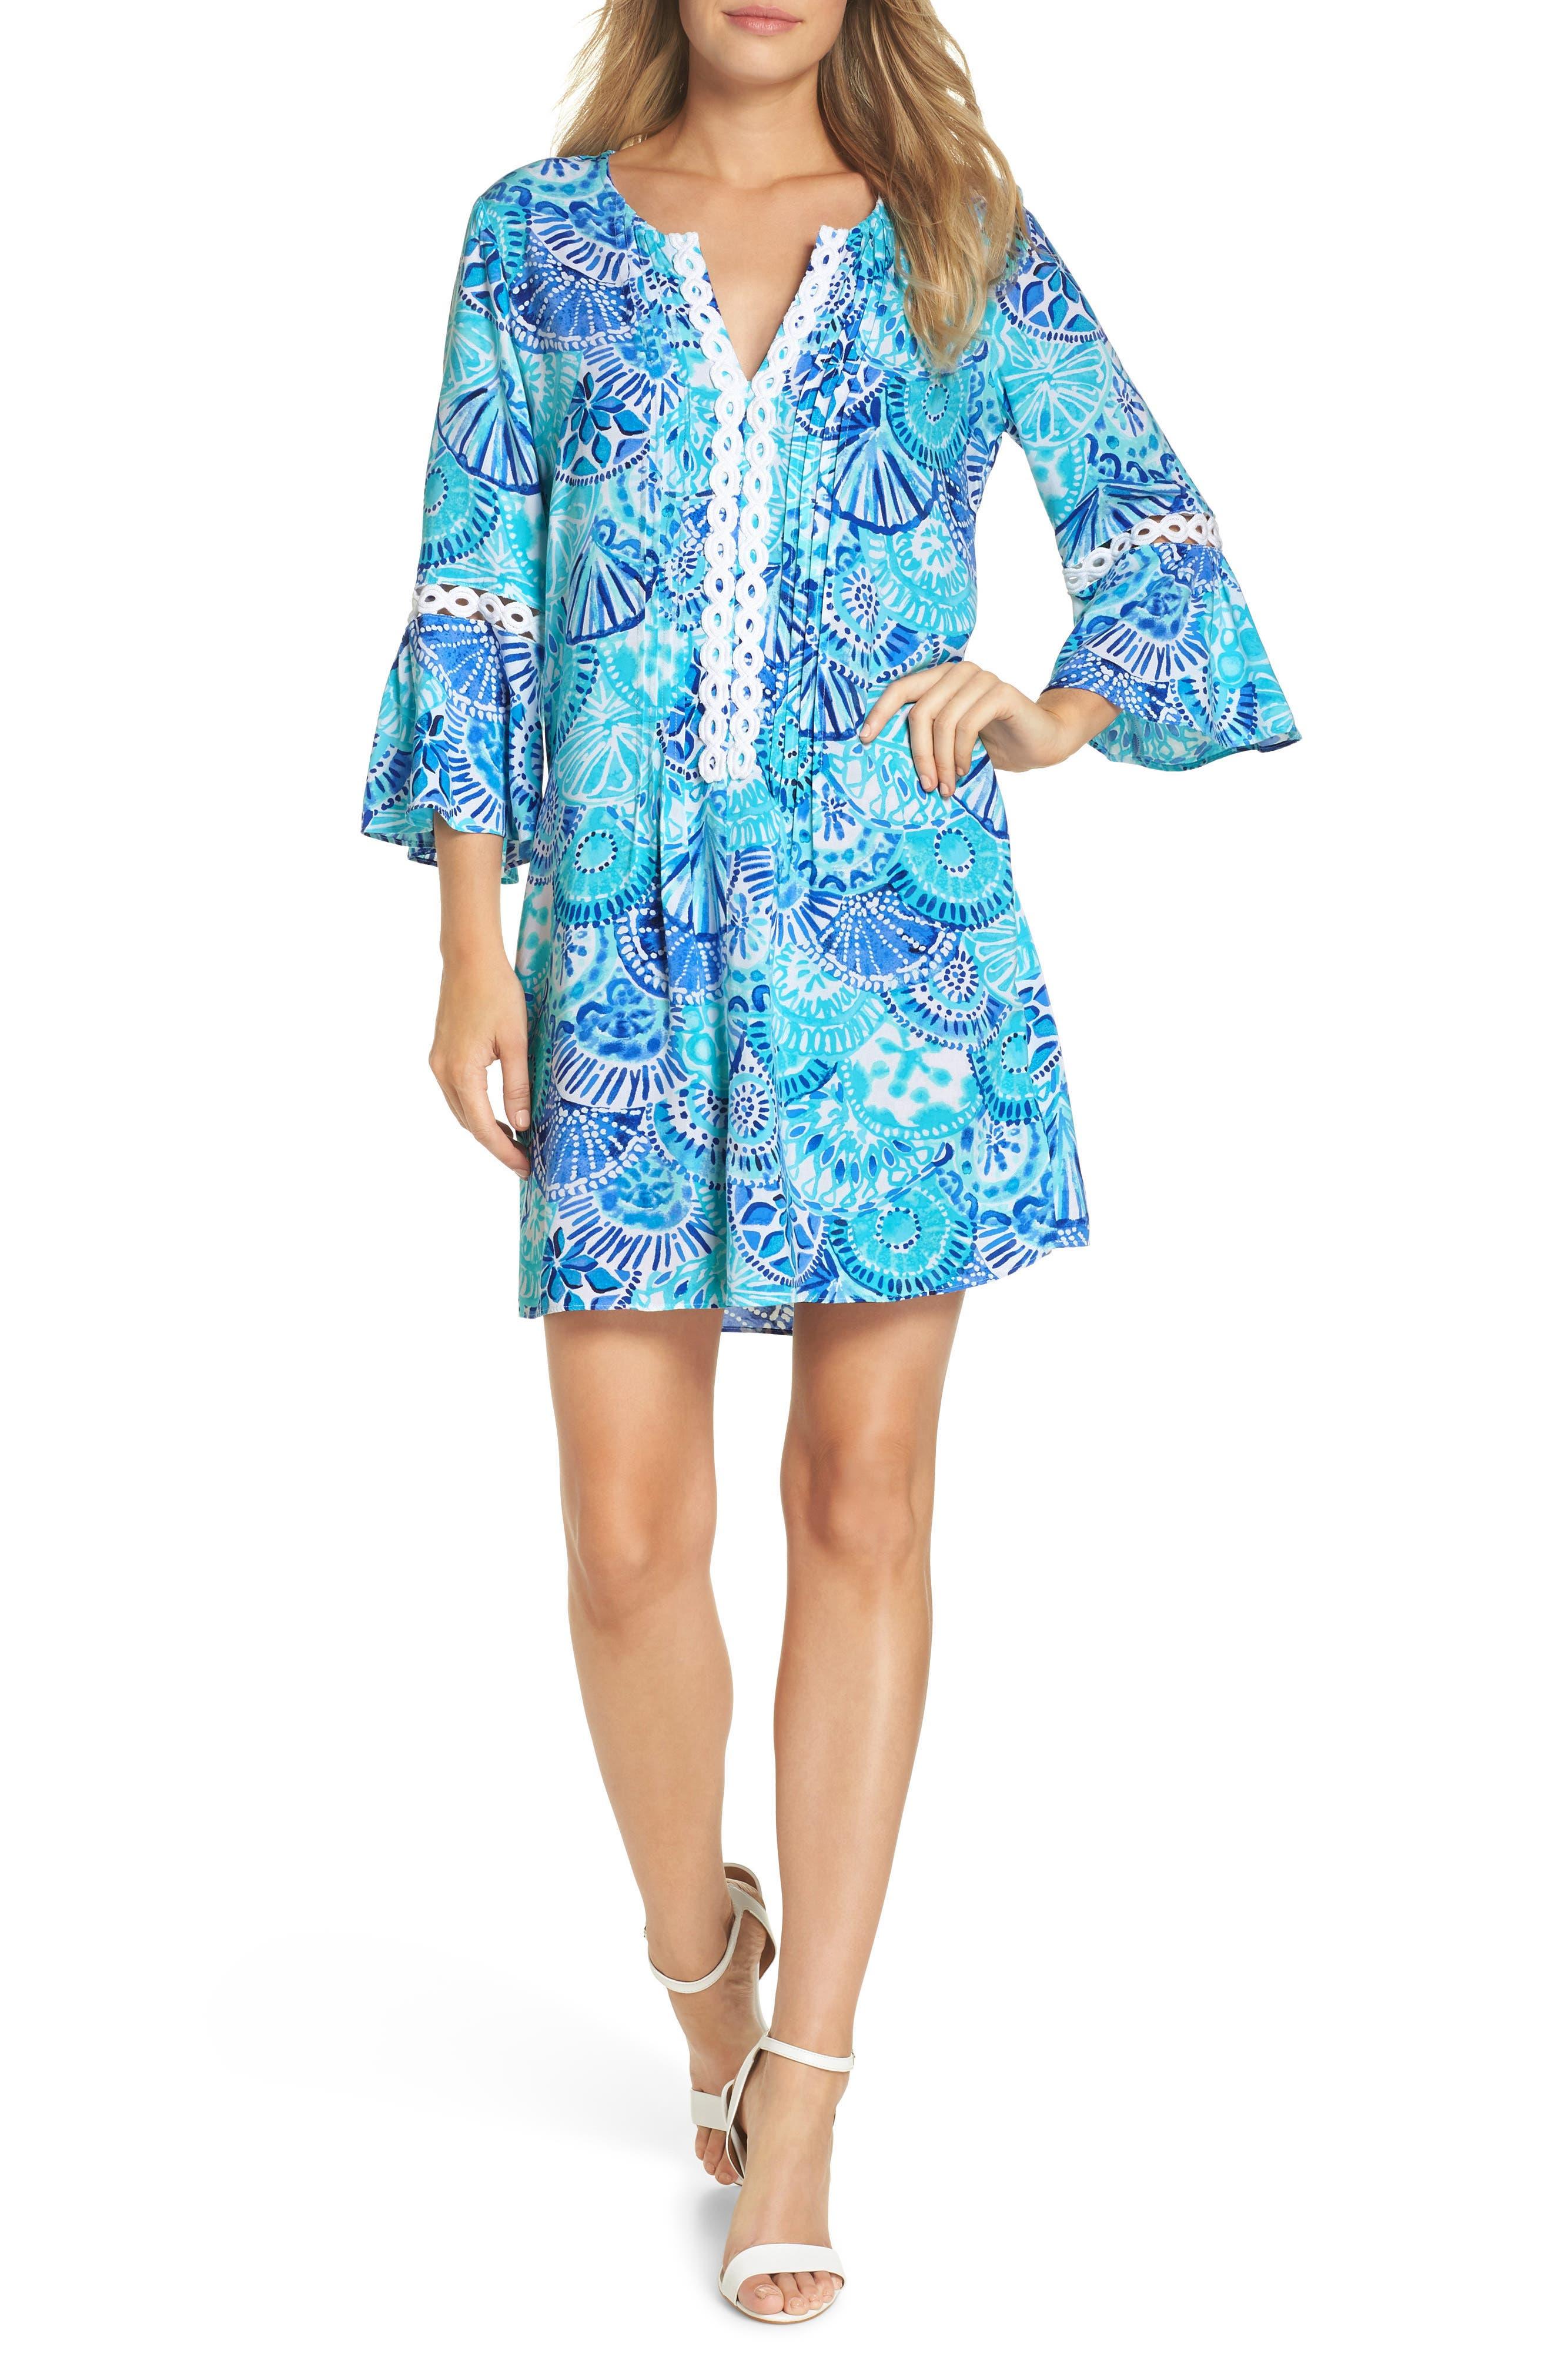 Lilly Pulitzer Hollie Cotton Shift Dress, Blue